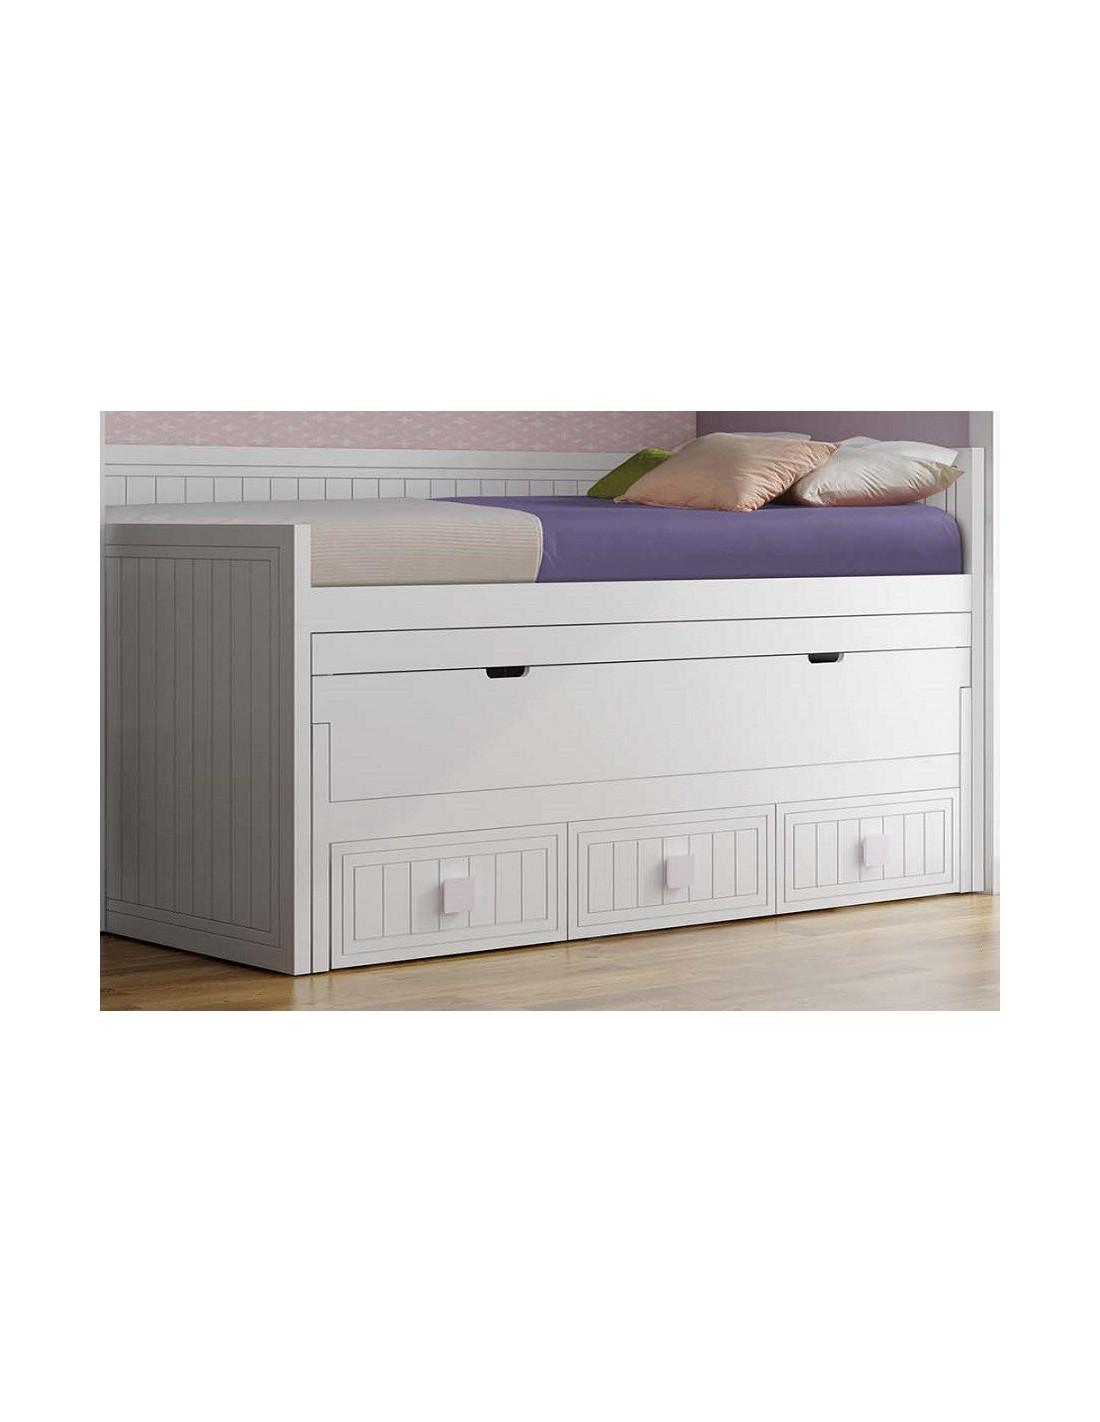 Cama compacta con escritorio muebles jueveniles noel for Cama compacta barata